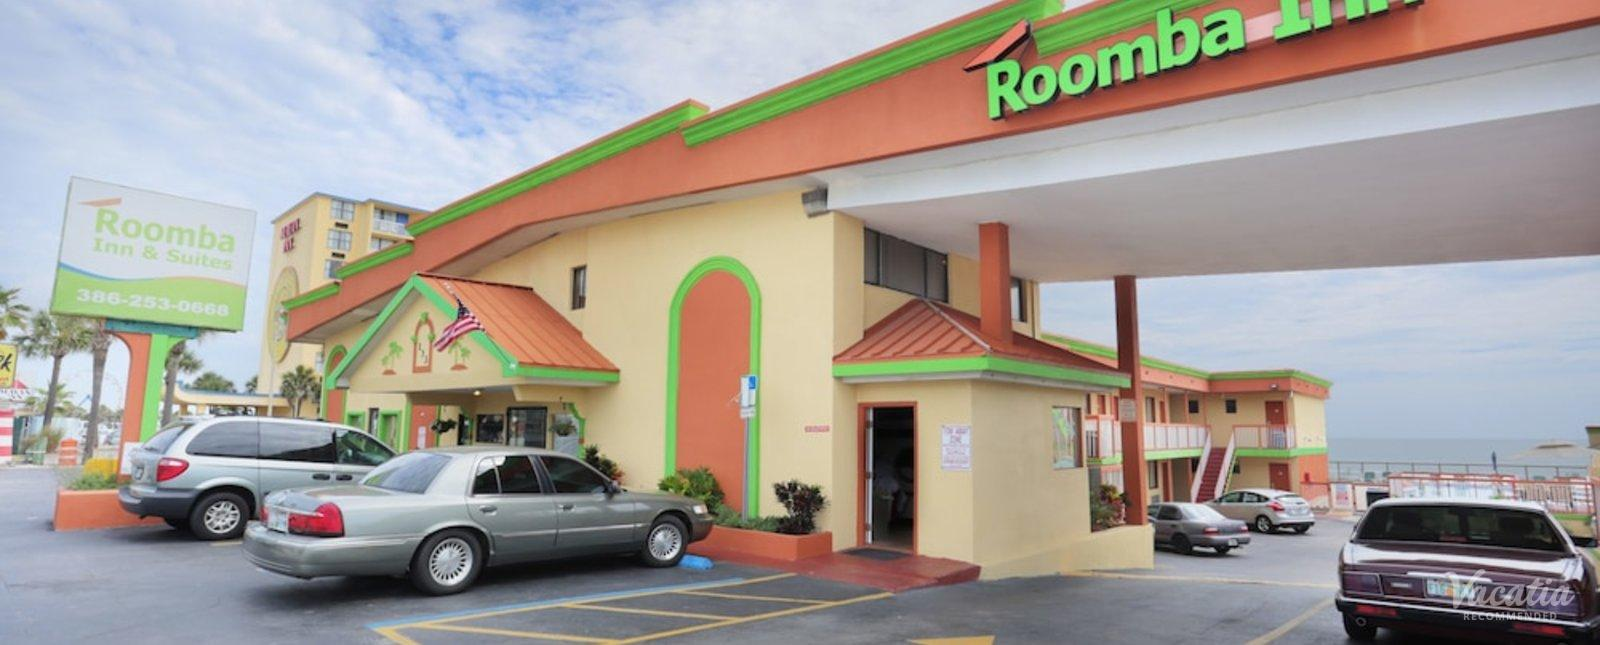 Roomba Inn Amp Suites Daytona Beach Hotels In Florida